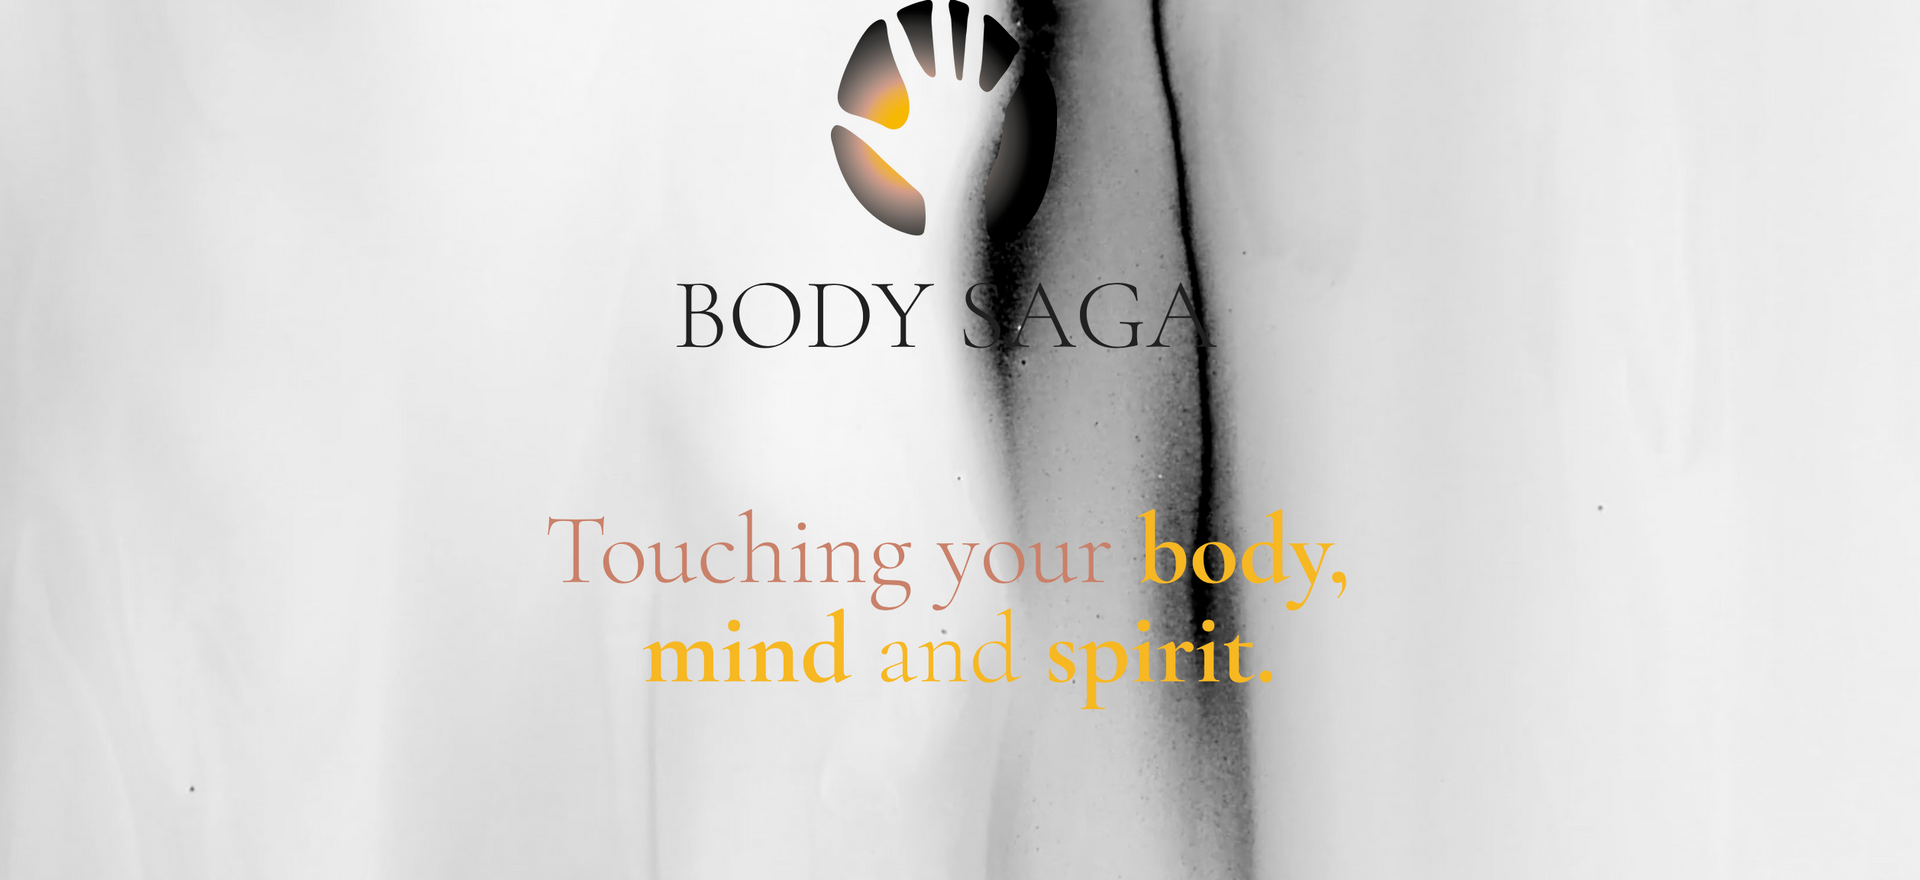 Body Saga. Hjemmeisde.